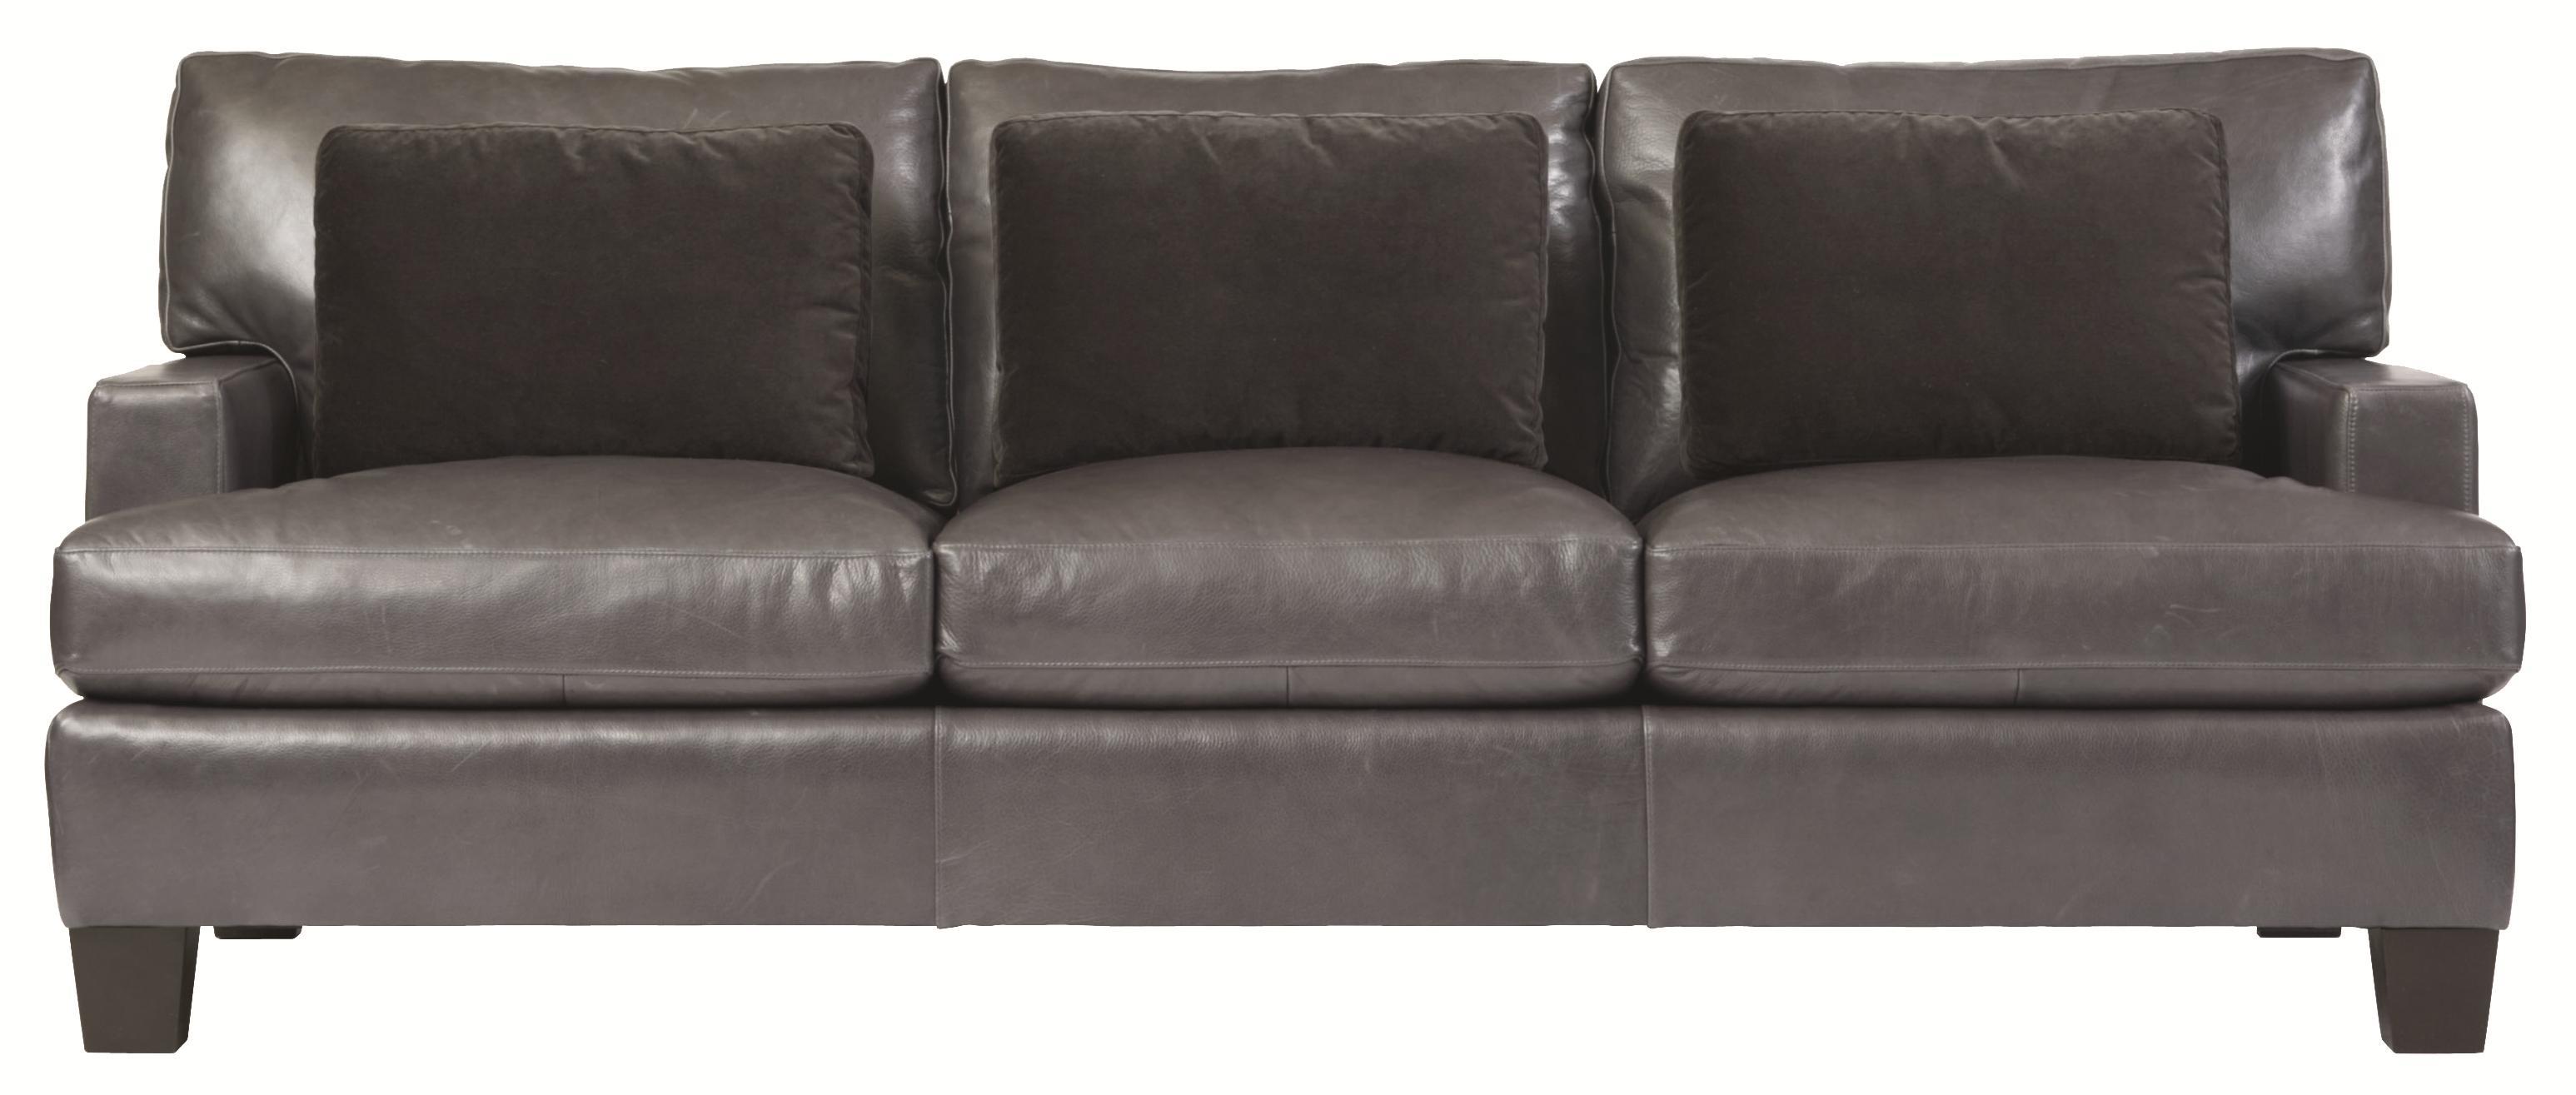 Bernhardt Interiors Denton Contemporary Sofa Sleeper